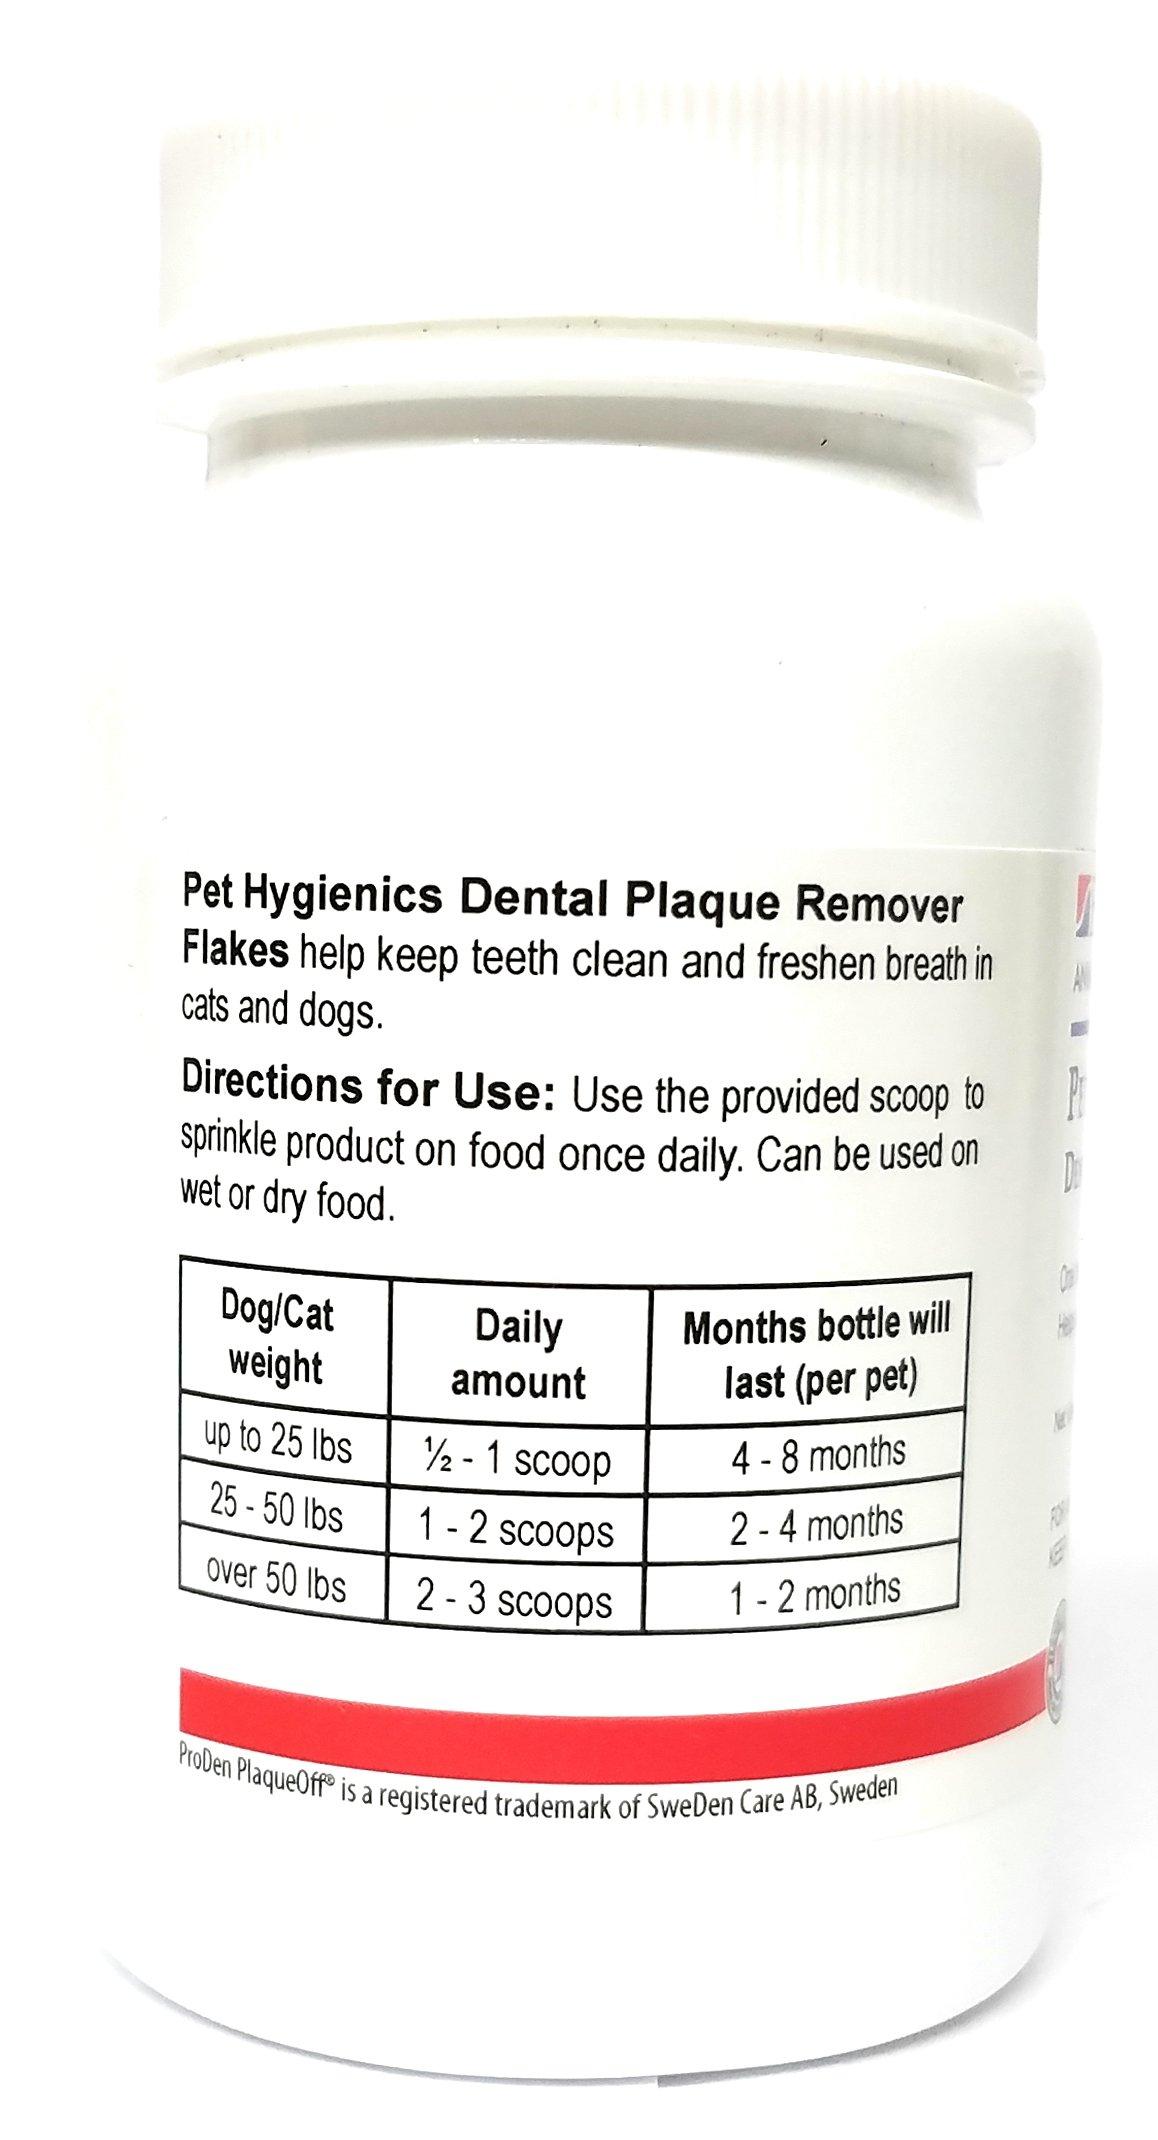 Henry Schein Pet Hygienics Dental Plaque Remover Flakes by Henry Schein (Image #1)